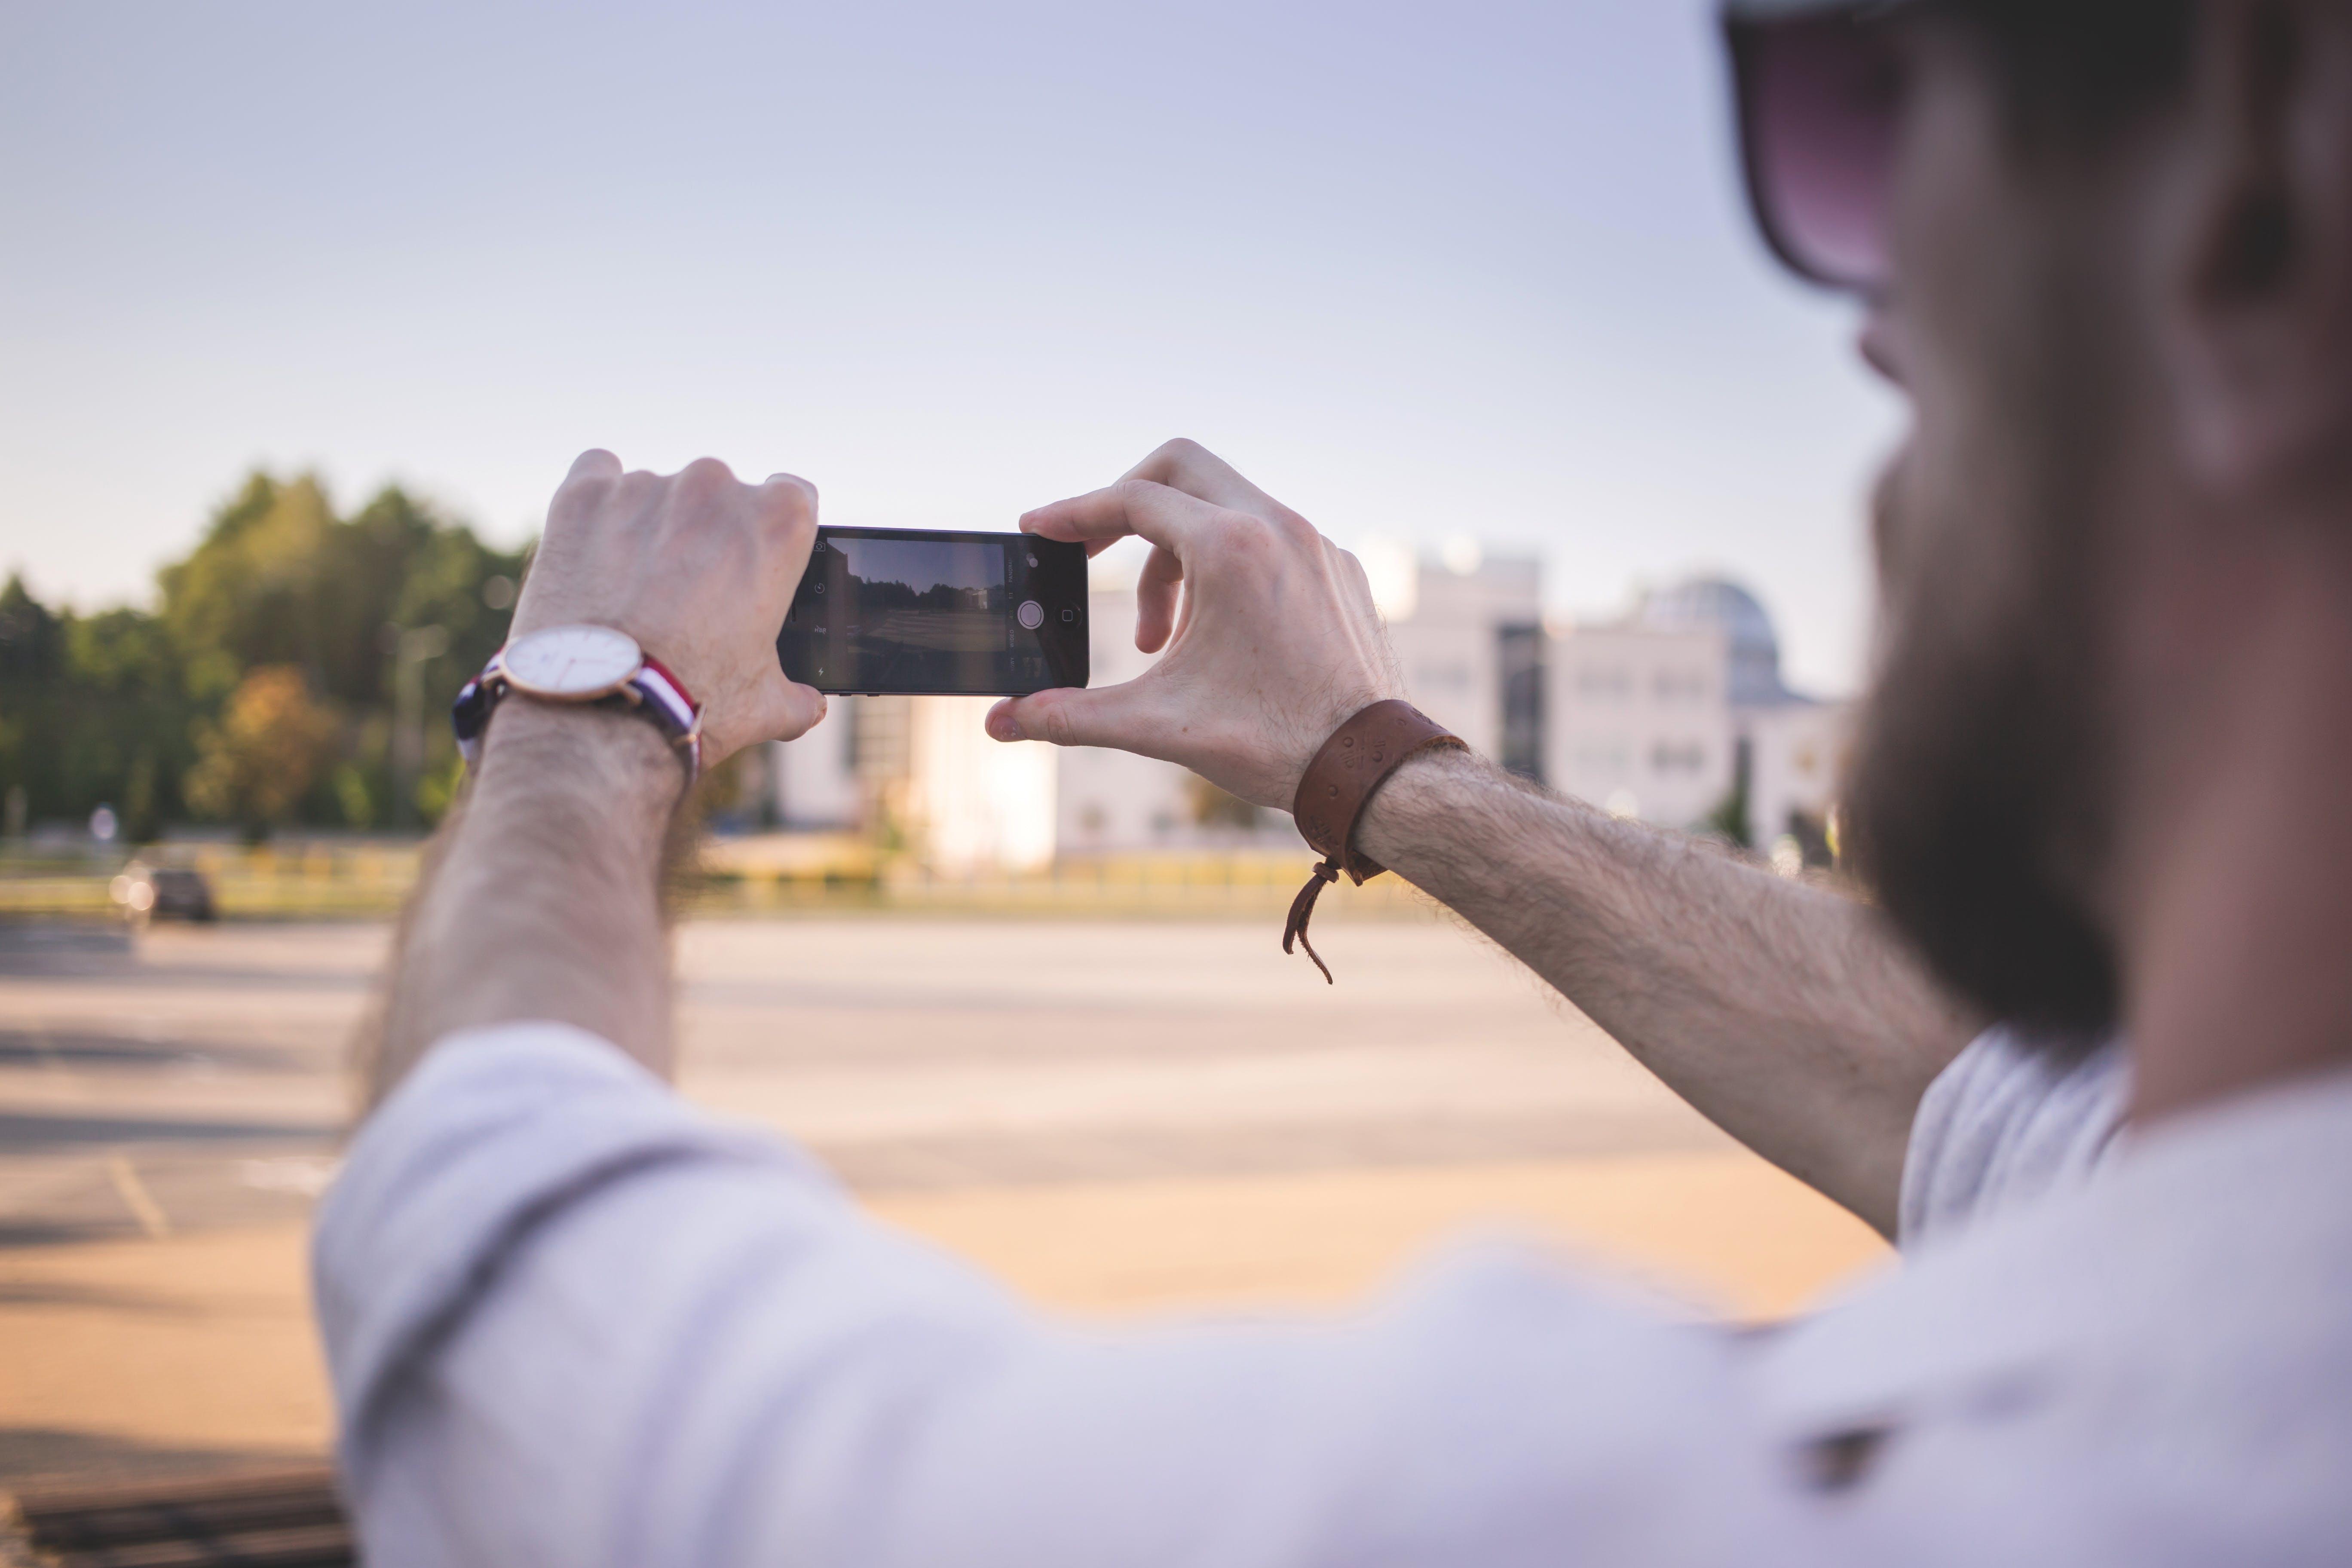 Tilt Shift Photo of Man Holding Black Smartphone Taking Photo of Gray Ground at Daytime